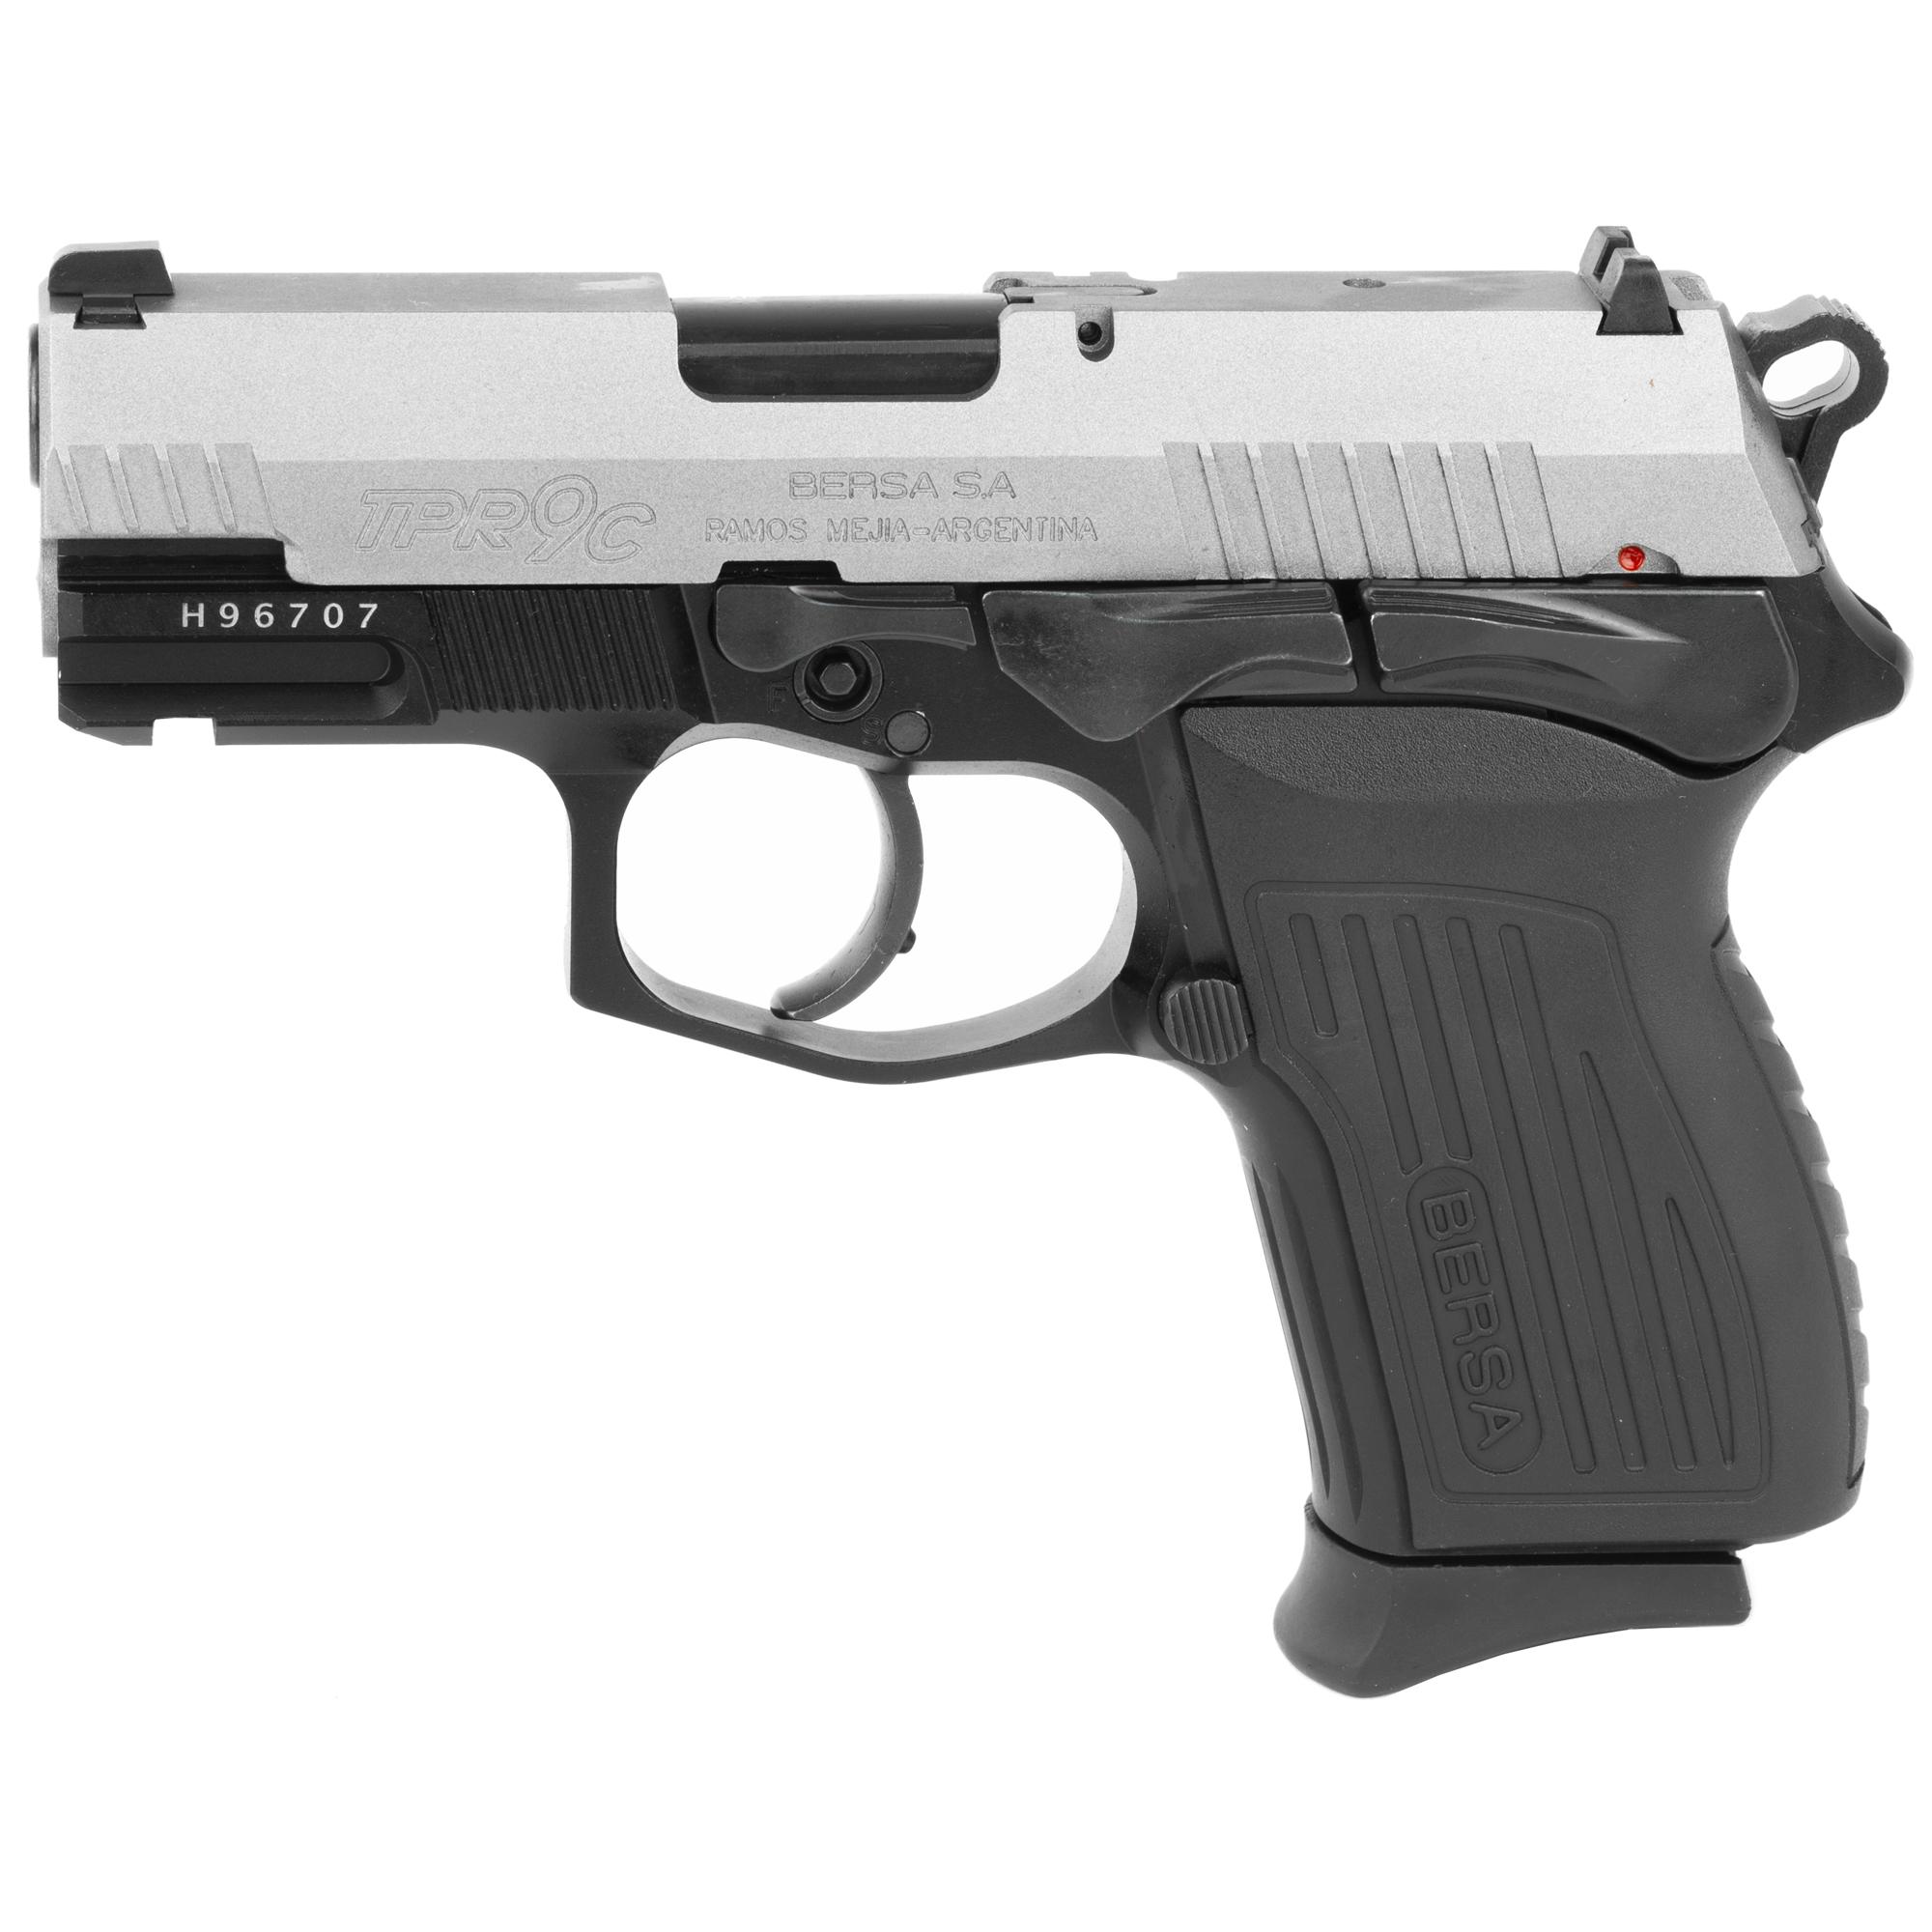 "Bersa Tprc 9mm Cmp Dt 3.2"" 13rd"